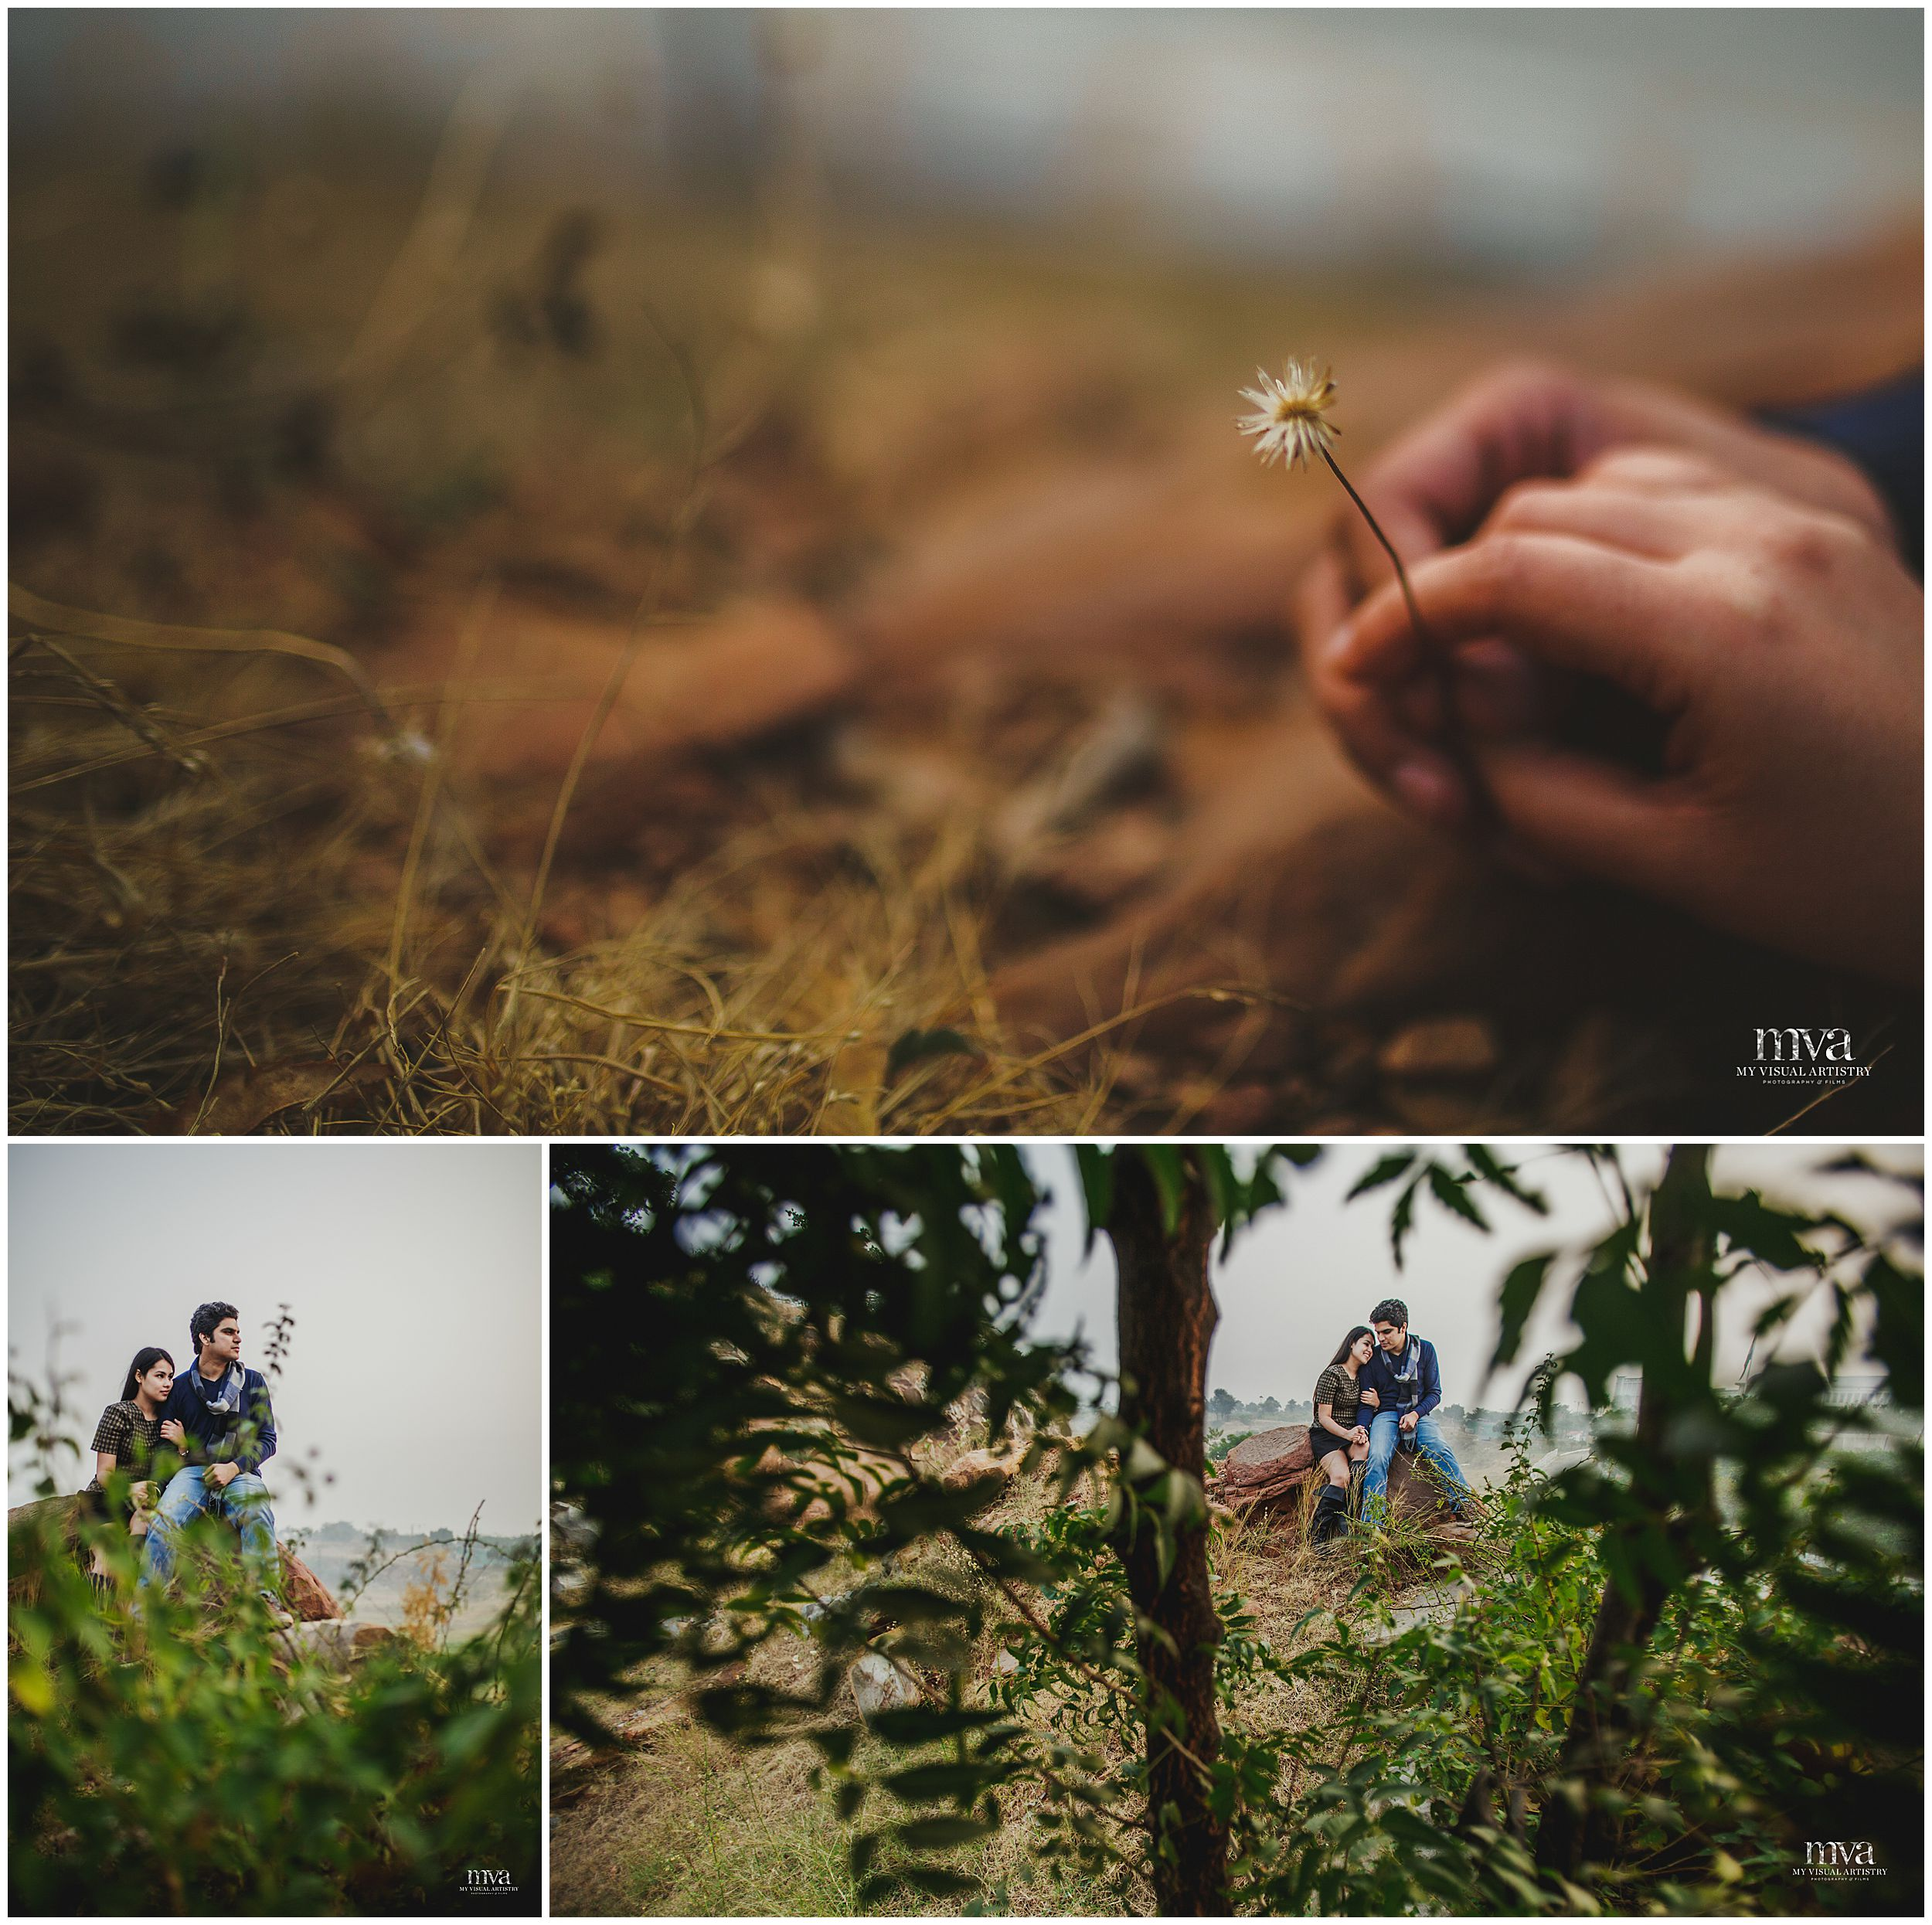 SAHIL_MANALI_MYVISUALARTISTRY__WEDDING_PHOTOGRAPHER_JANNATVALLEY_COUPLESHOOT_DESTINATION_FARIDABAD_PREWEDDING3.jpg